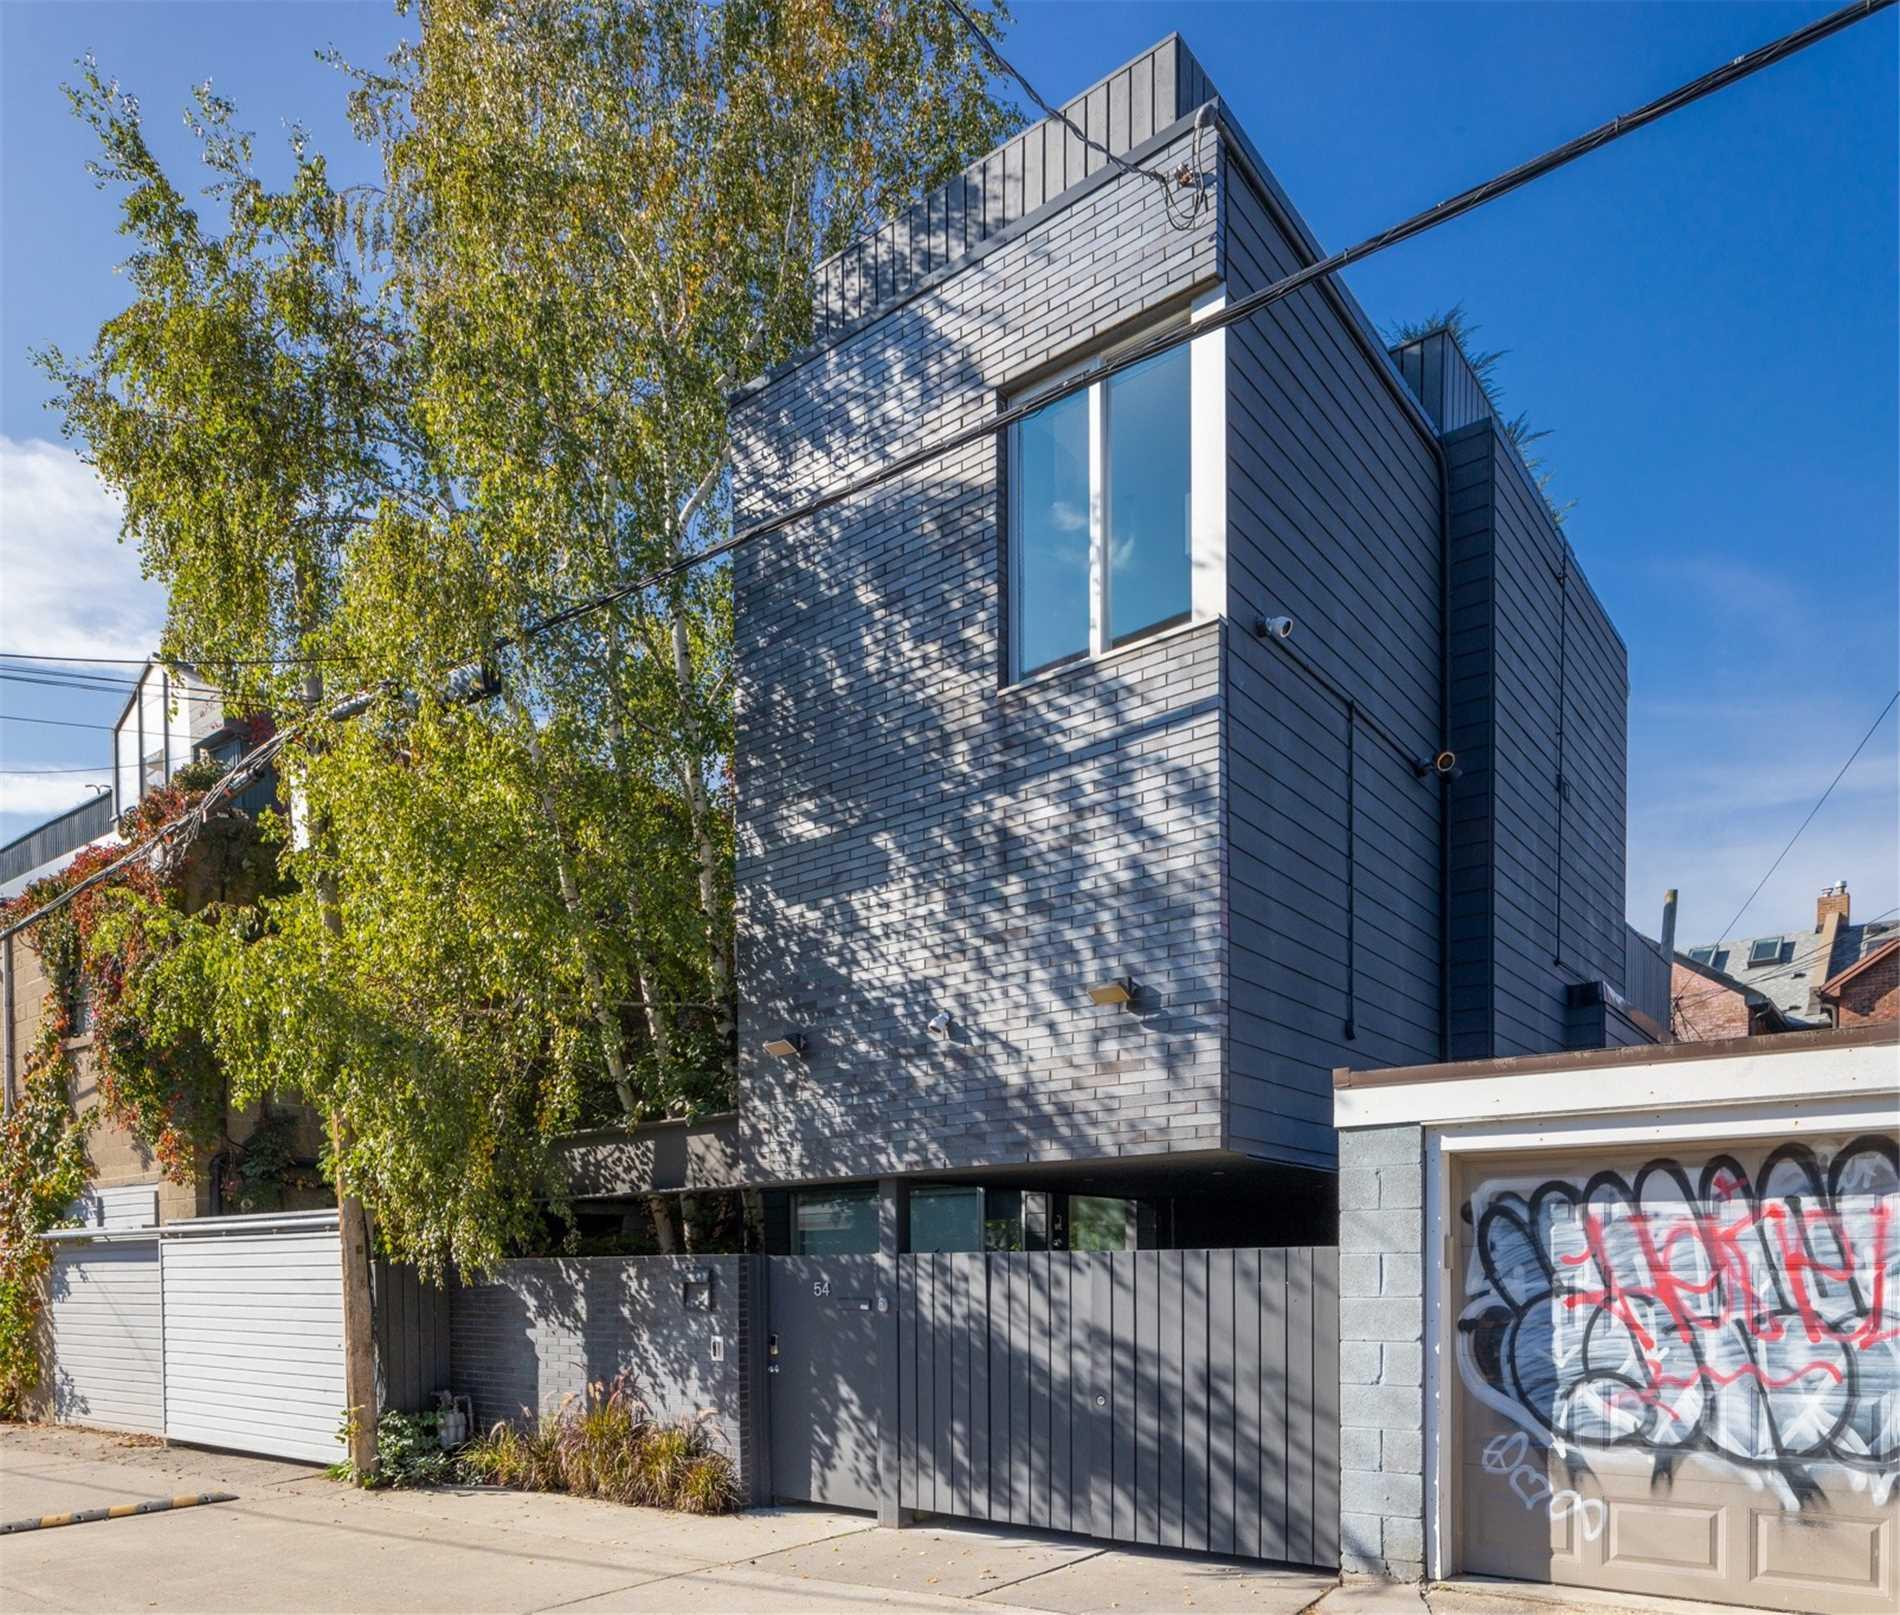 Detached house For Sale In Toronto - 54 Croft St, Toronto, Ontario, Canada M5S2N9 , 3 Bedrooms Bedrooms, ,3 BathroomsBathrooms,Detached,For Sale,Croft